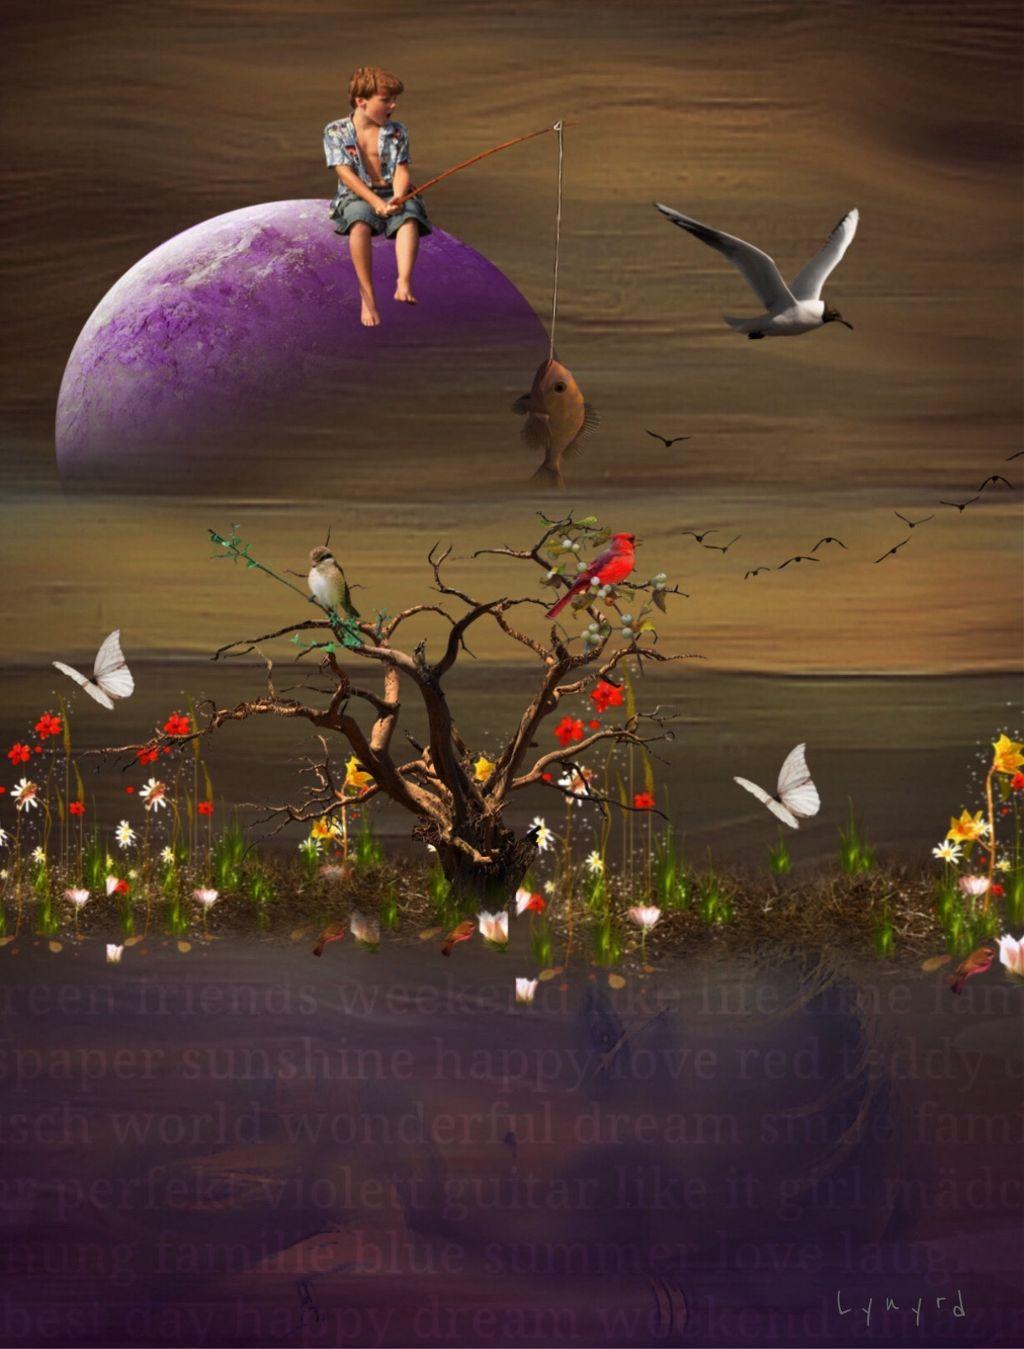 #freetoedit #doubleexposure #fantasy #art  #surreal #myedit #madewithpicsart #awesomestickers